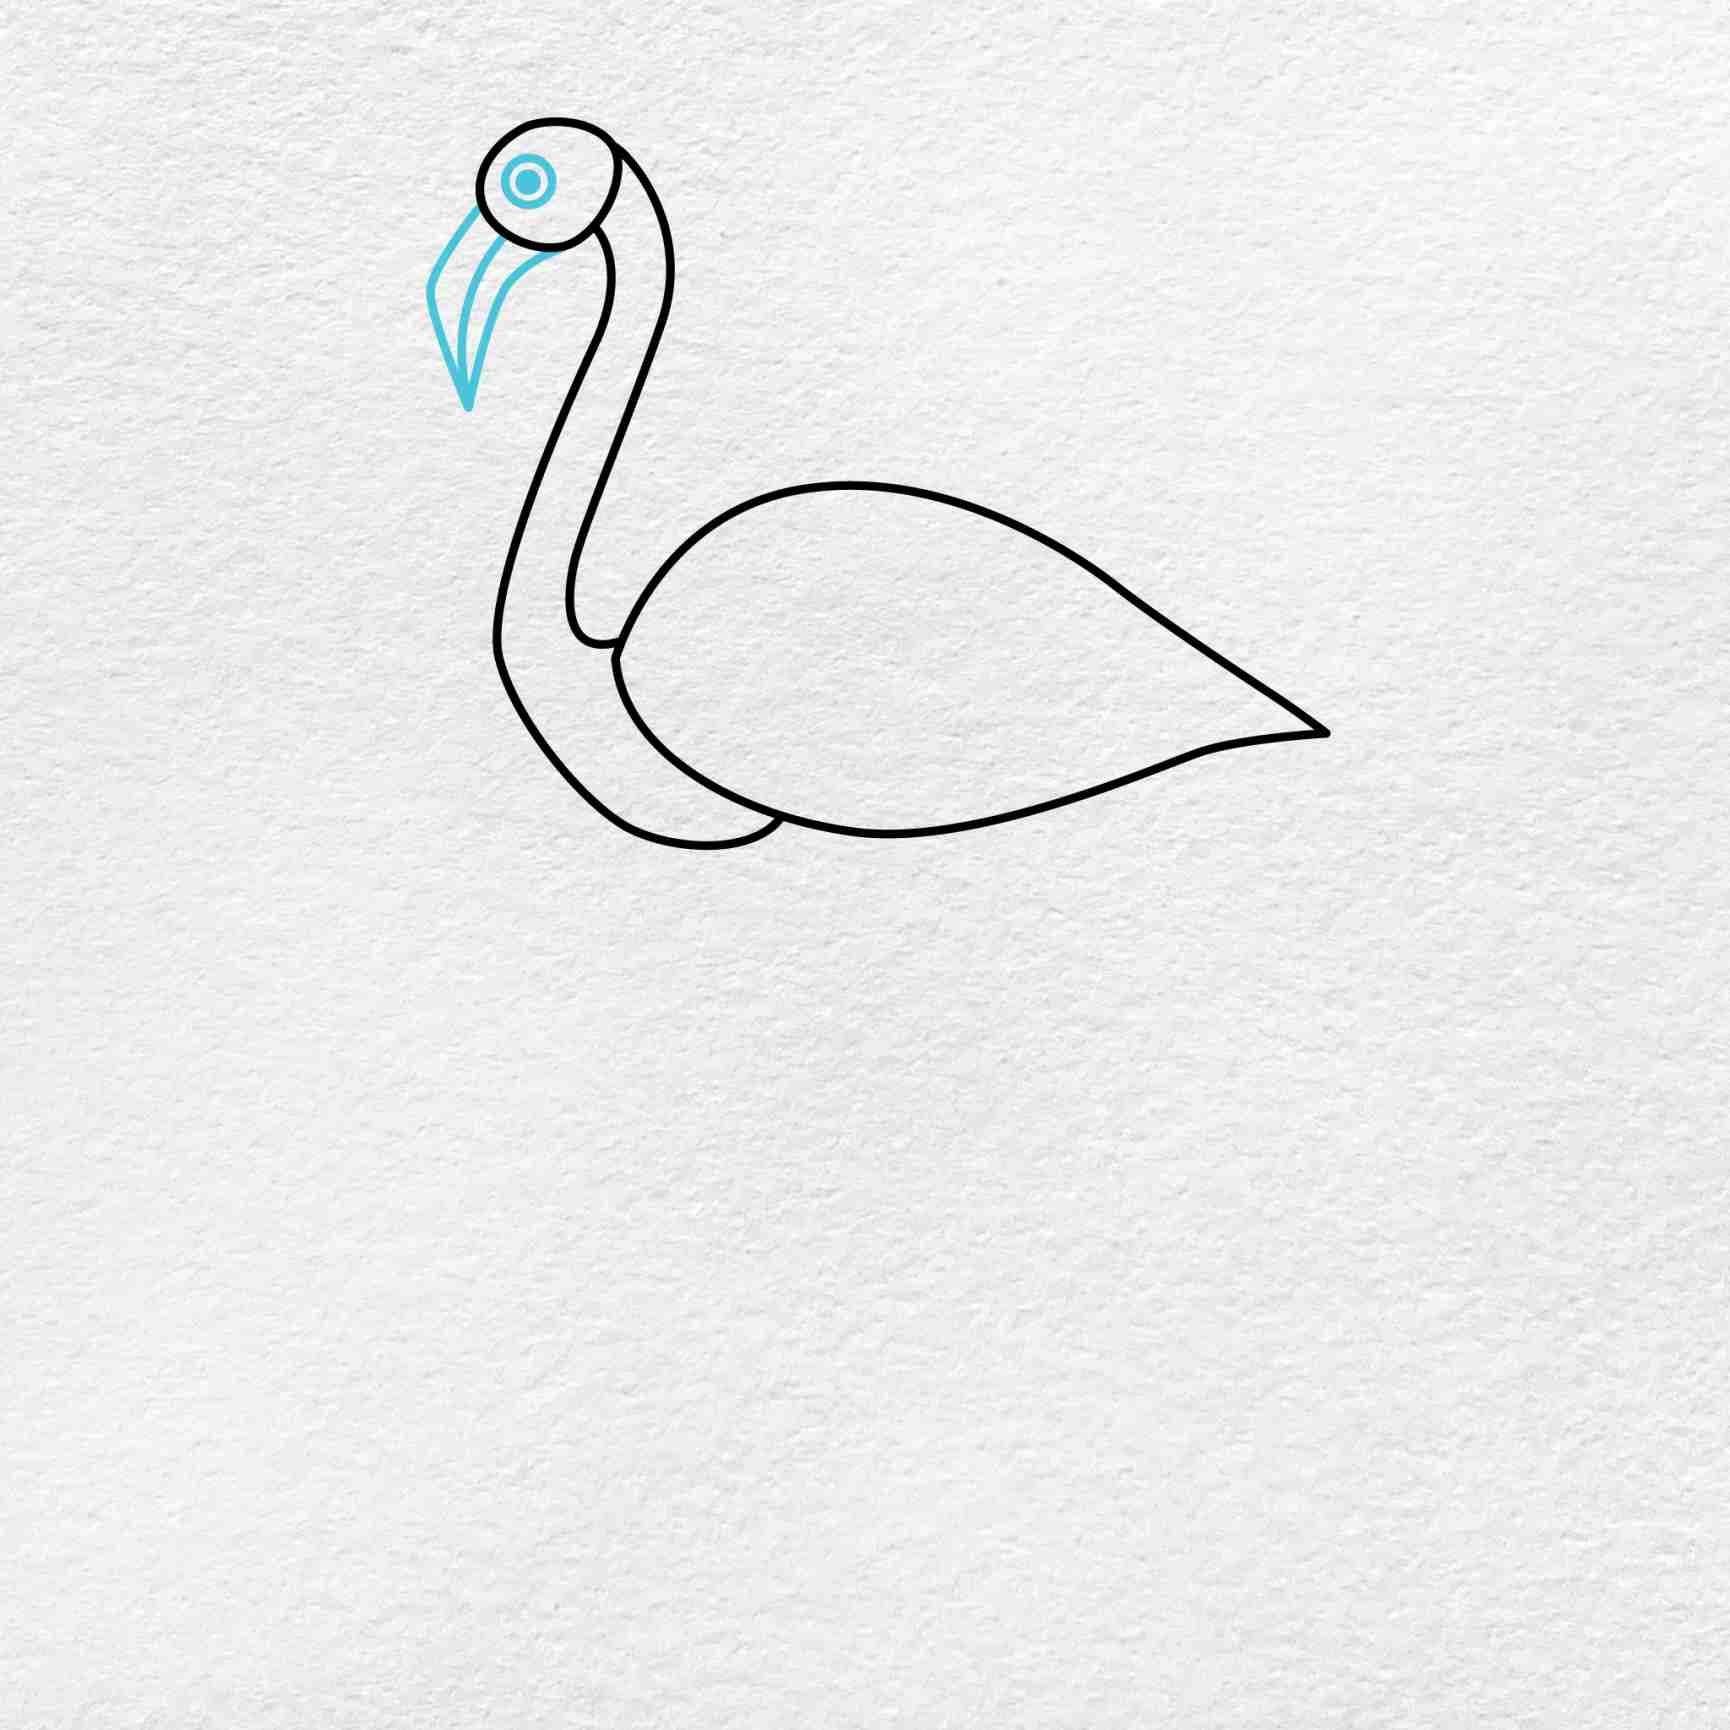 Flamingo Drawing: Step 3